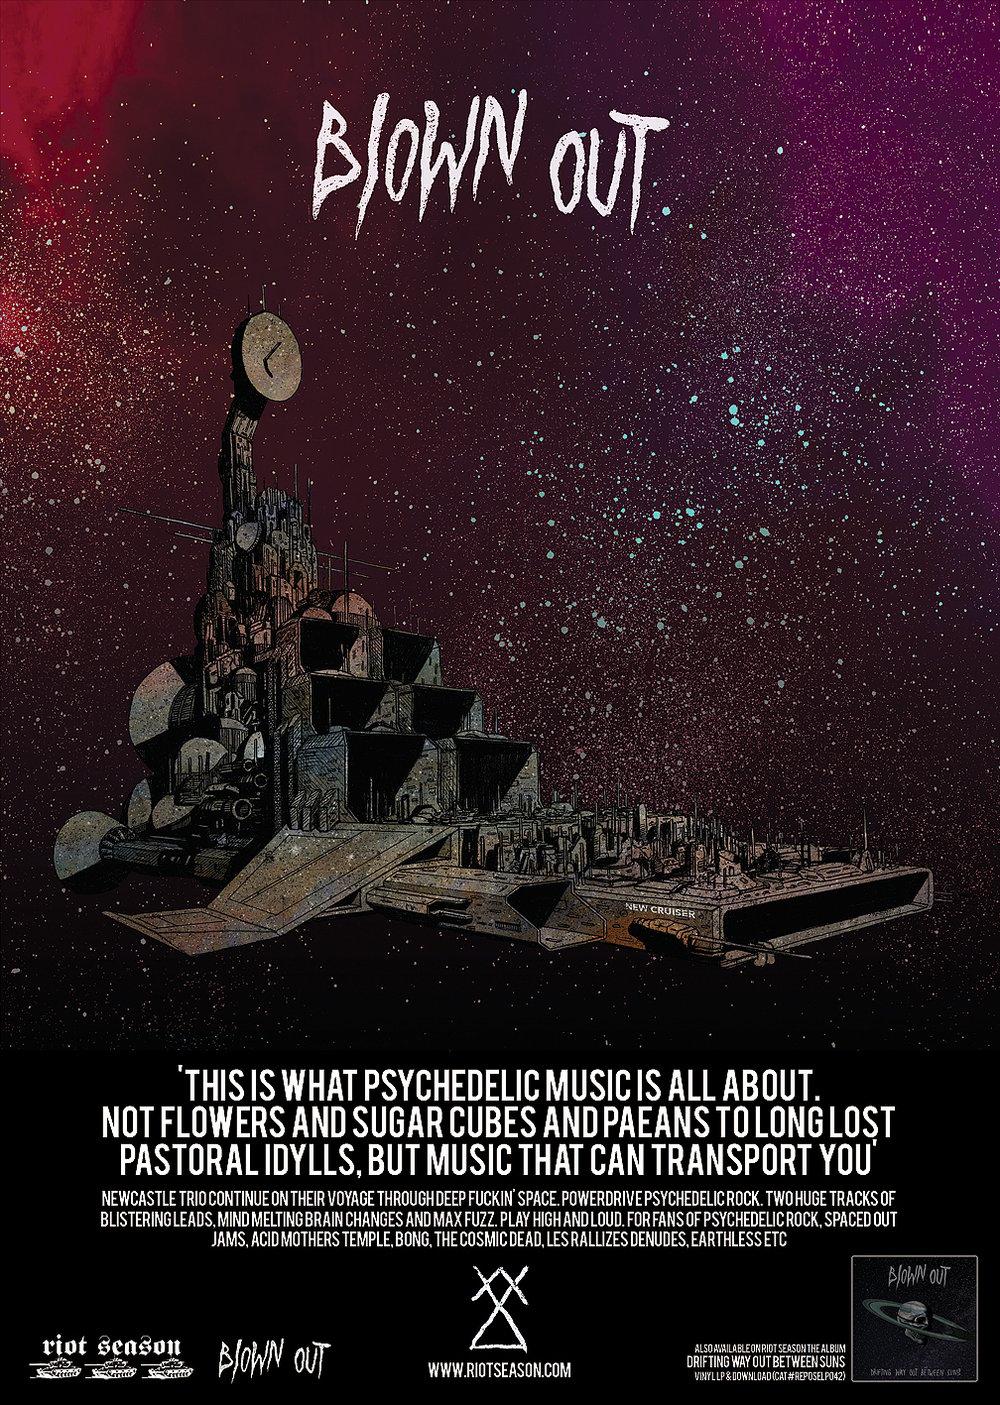 BLOWN OUT 'New Cruiser' Space Black Vinyl LP